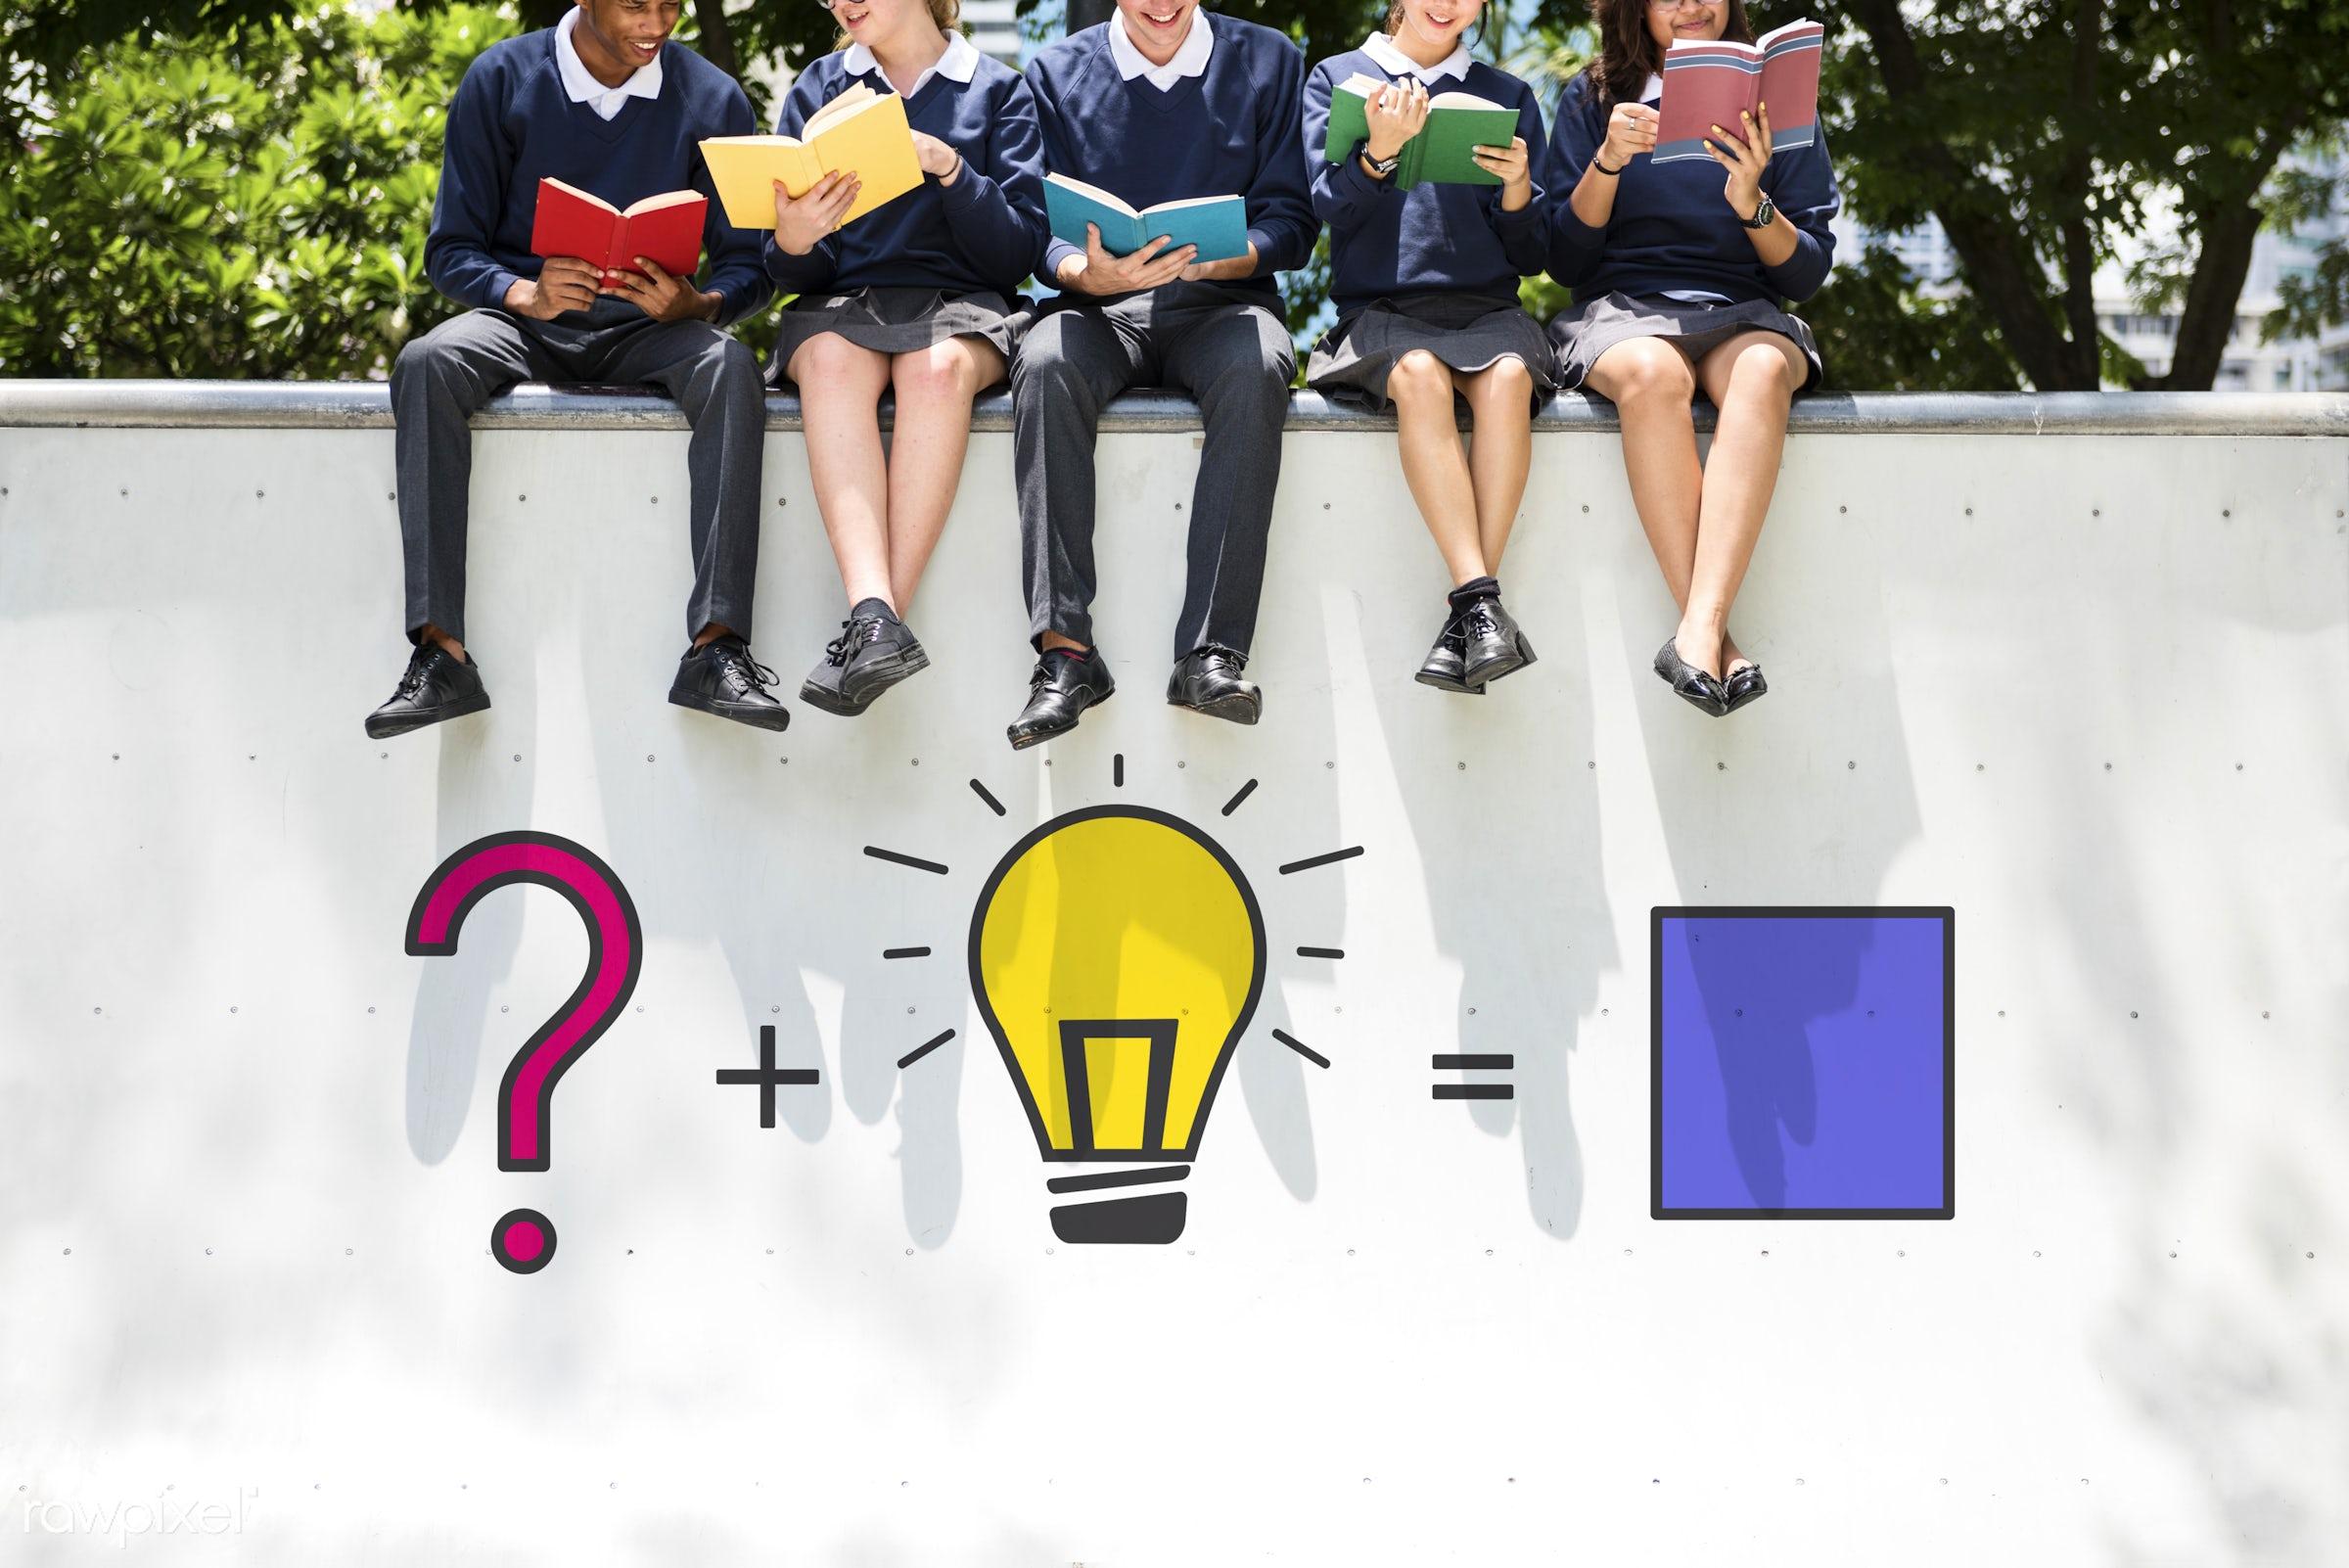 books, brainstorming, business, class, college, company, create, creative, diversity, friends, friendship, generate,...